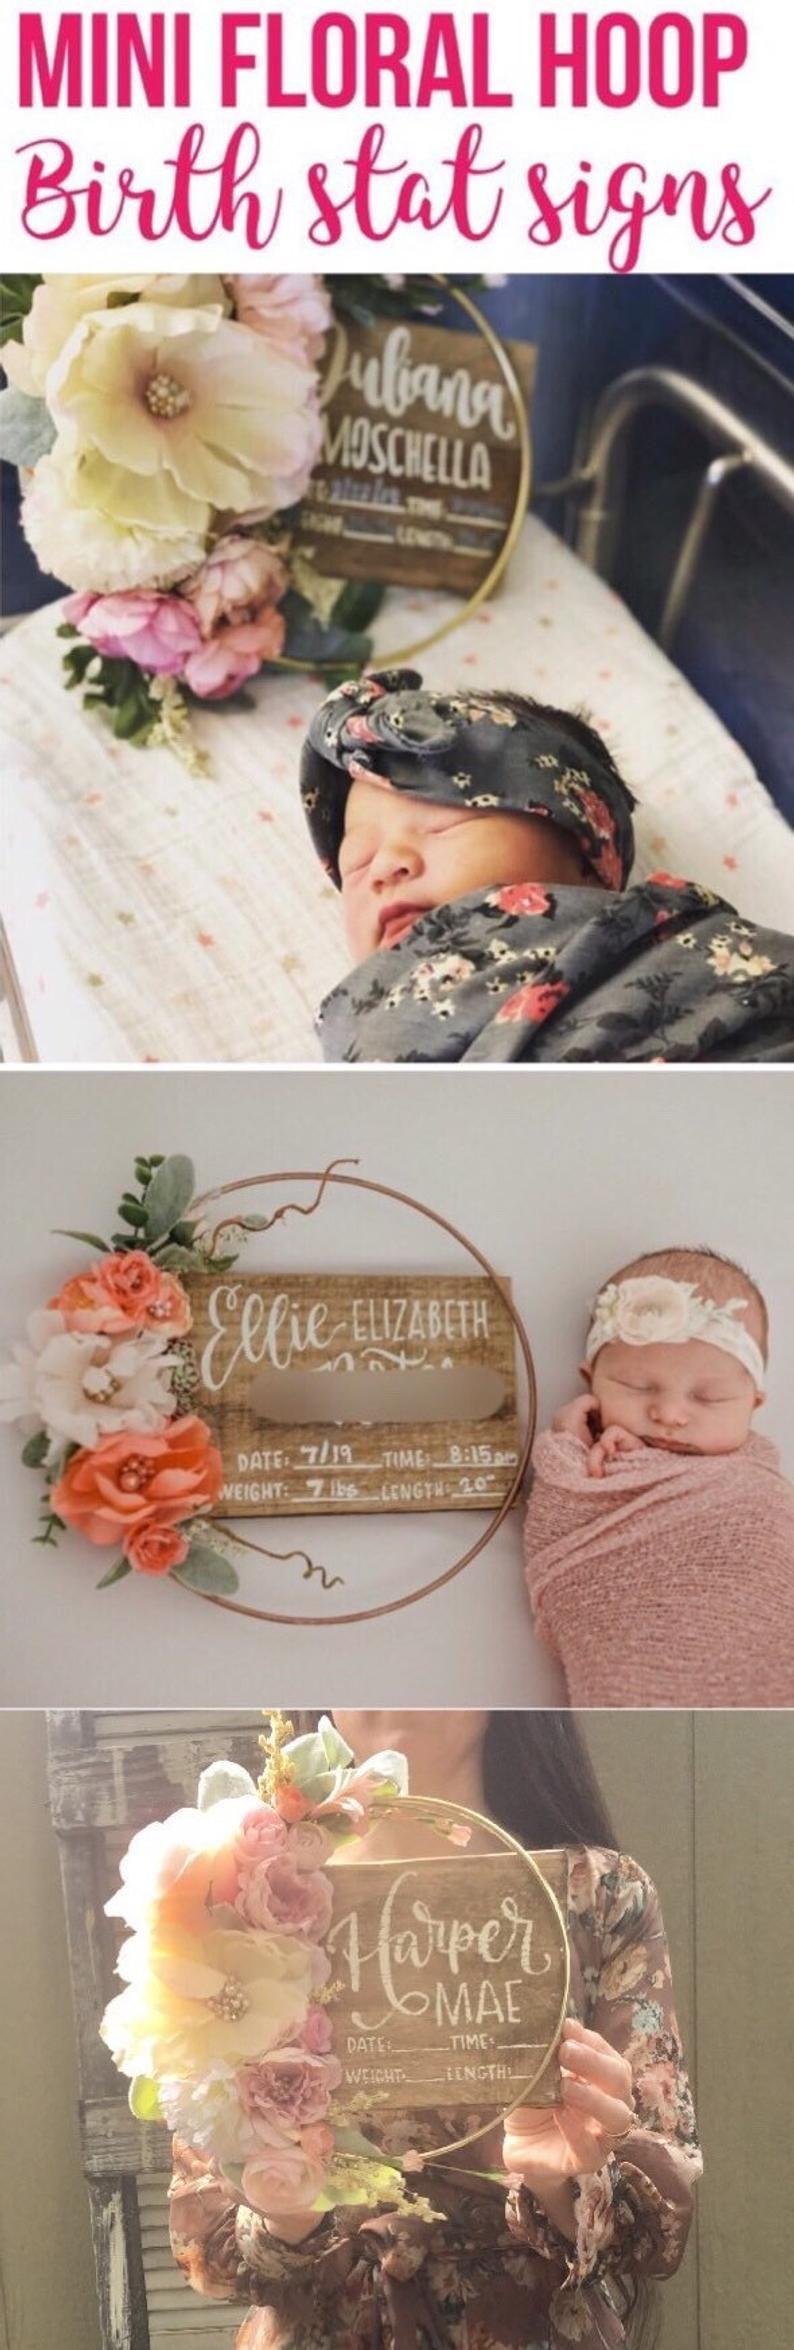 Birth stat Floral hoop hospital sign, birth stat sign